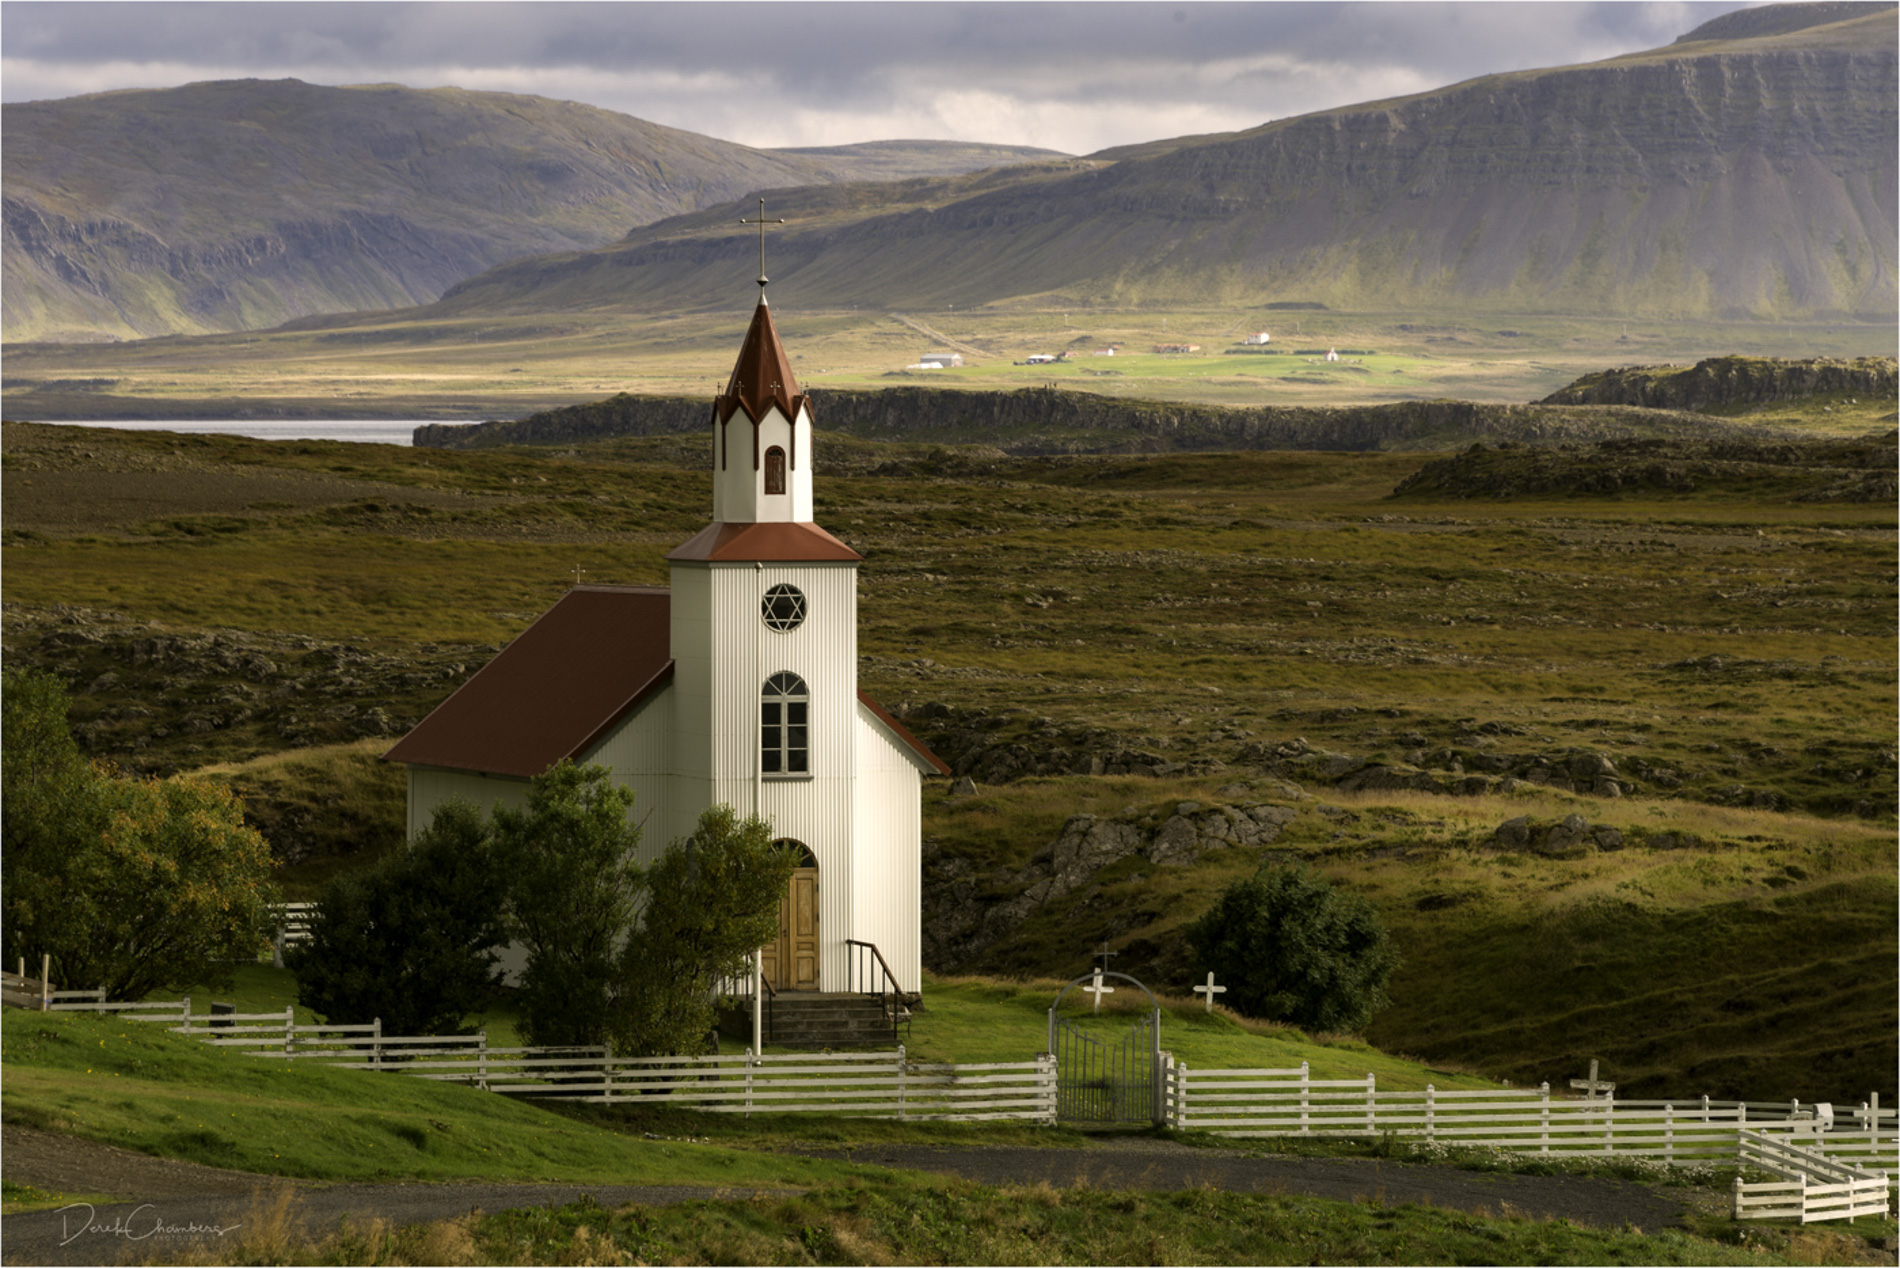 Icelandic Church V1 - Derek Chambers